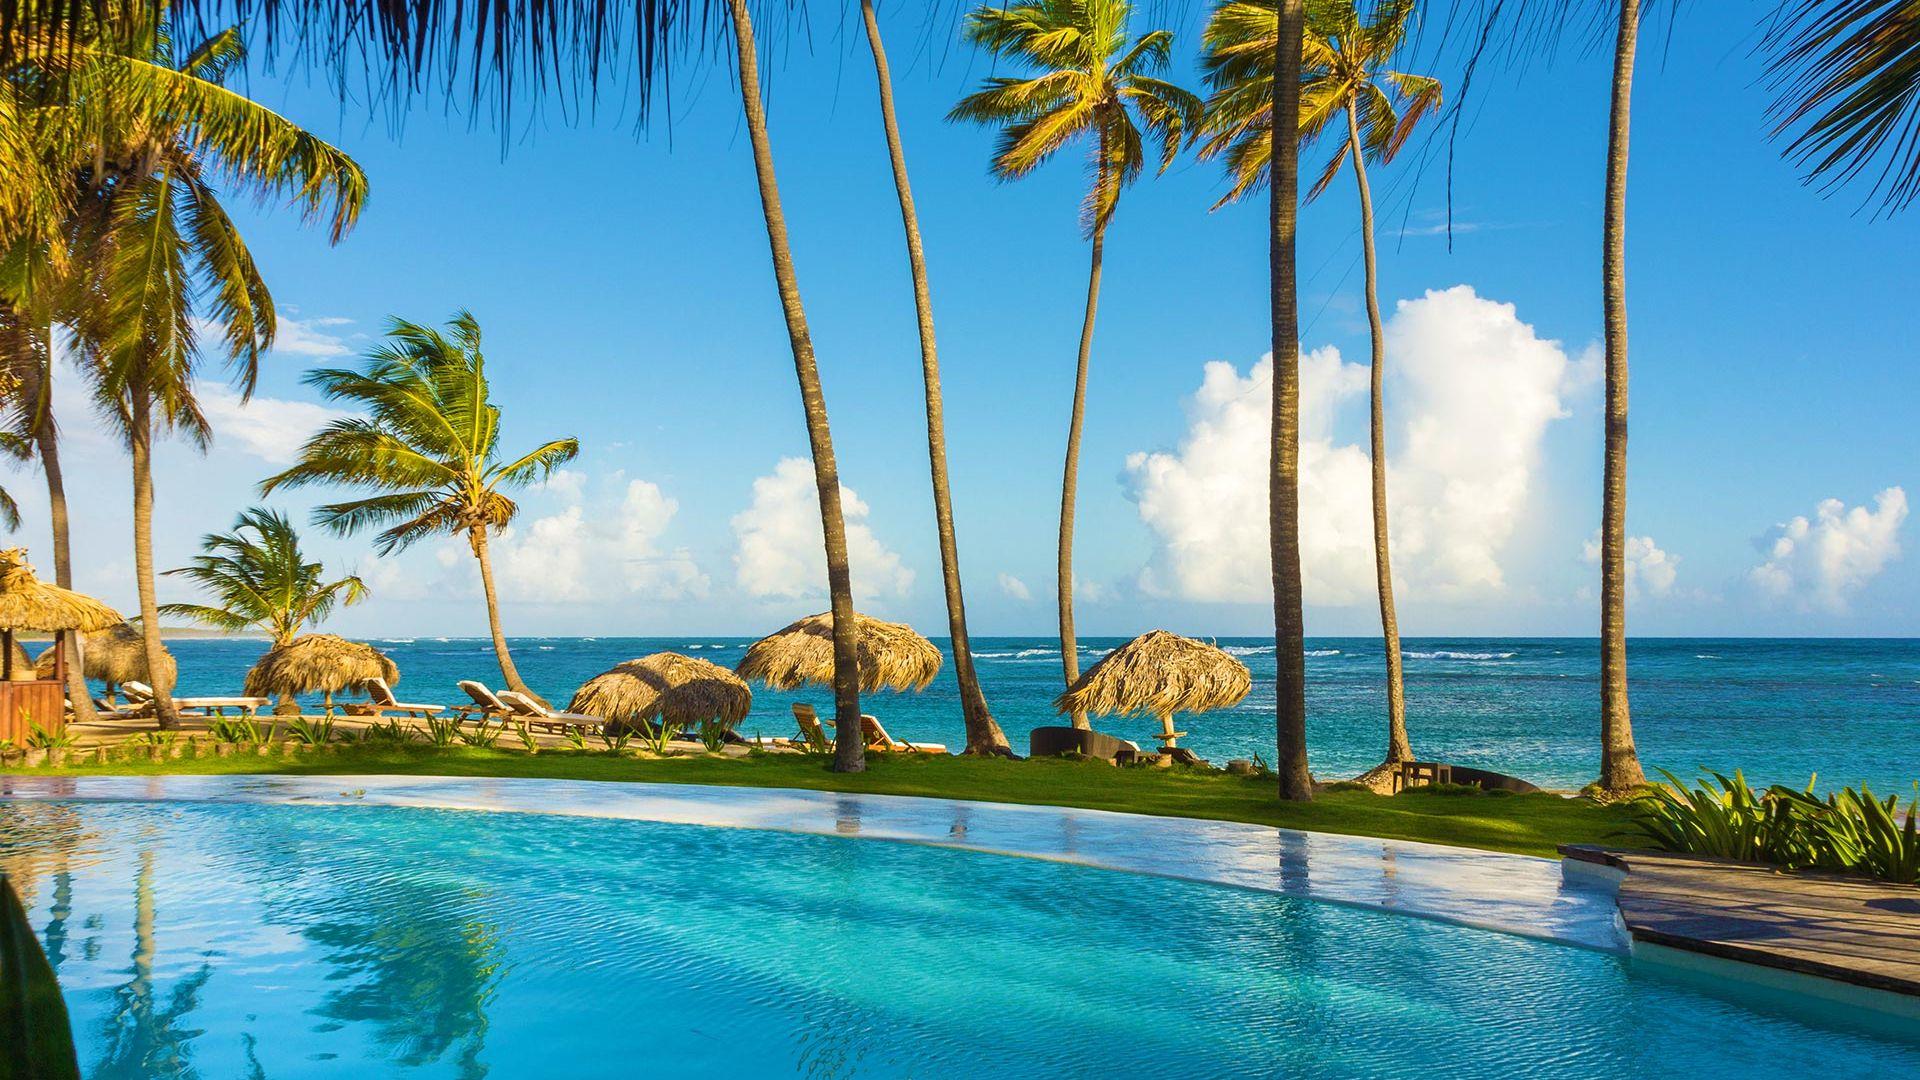 Sejur plaja Punta Cana, 9 zile - martie 2022